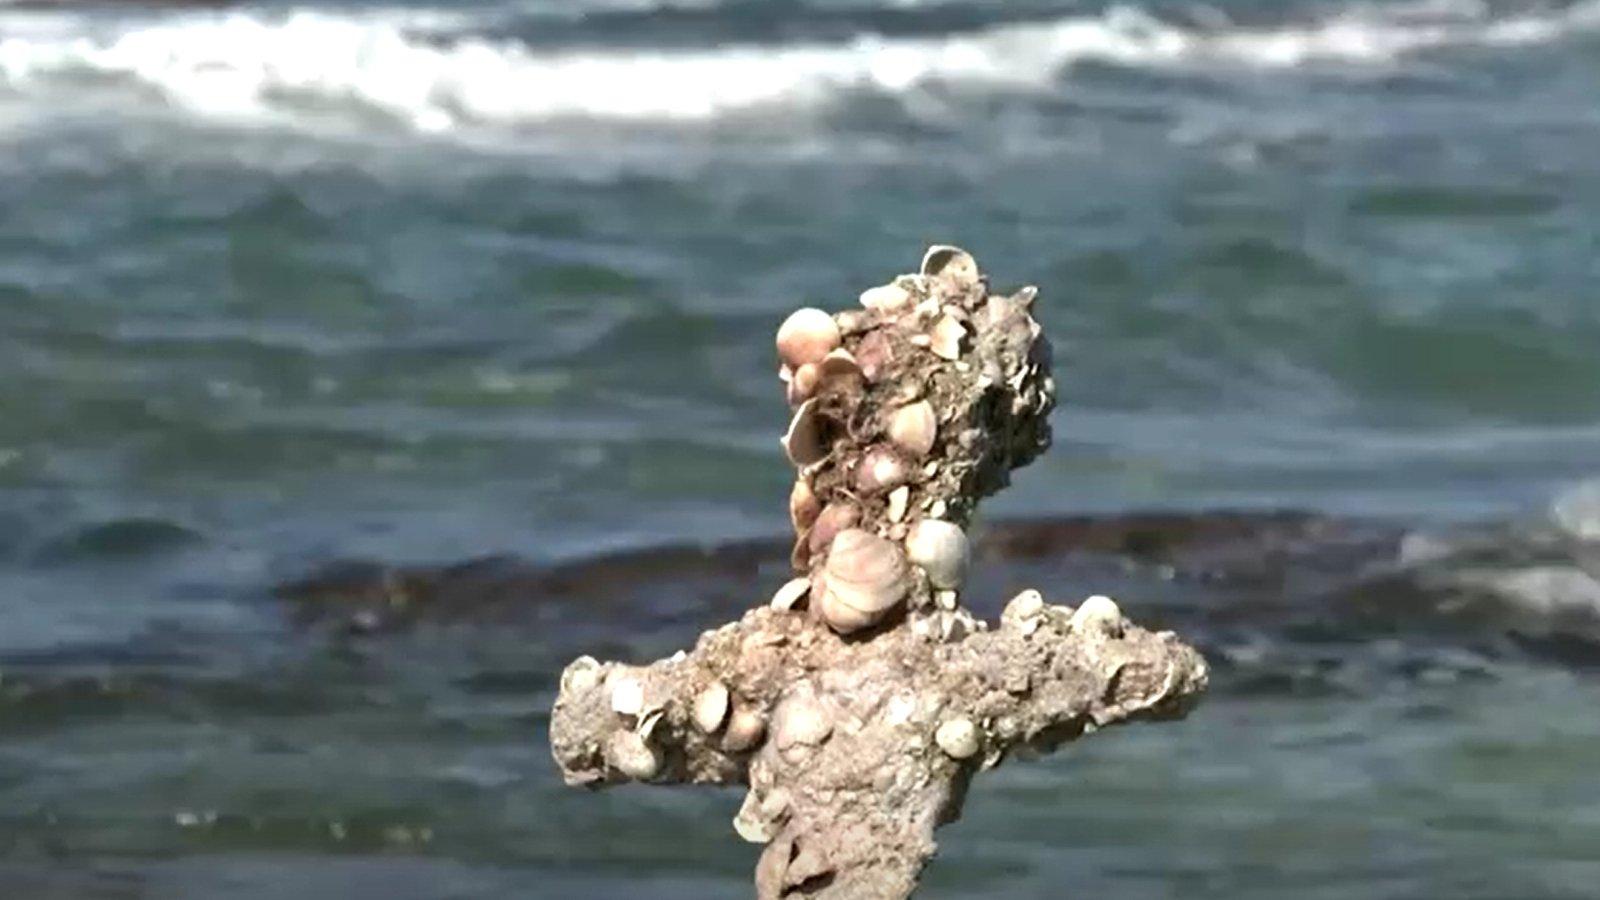 900-year-old sword found embedded in shells off Israel